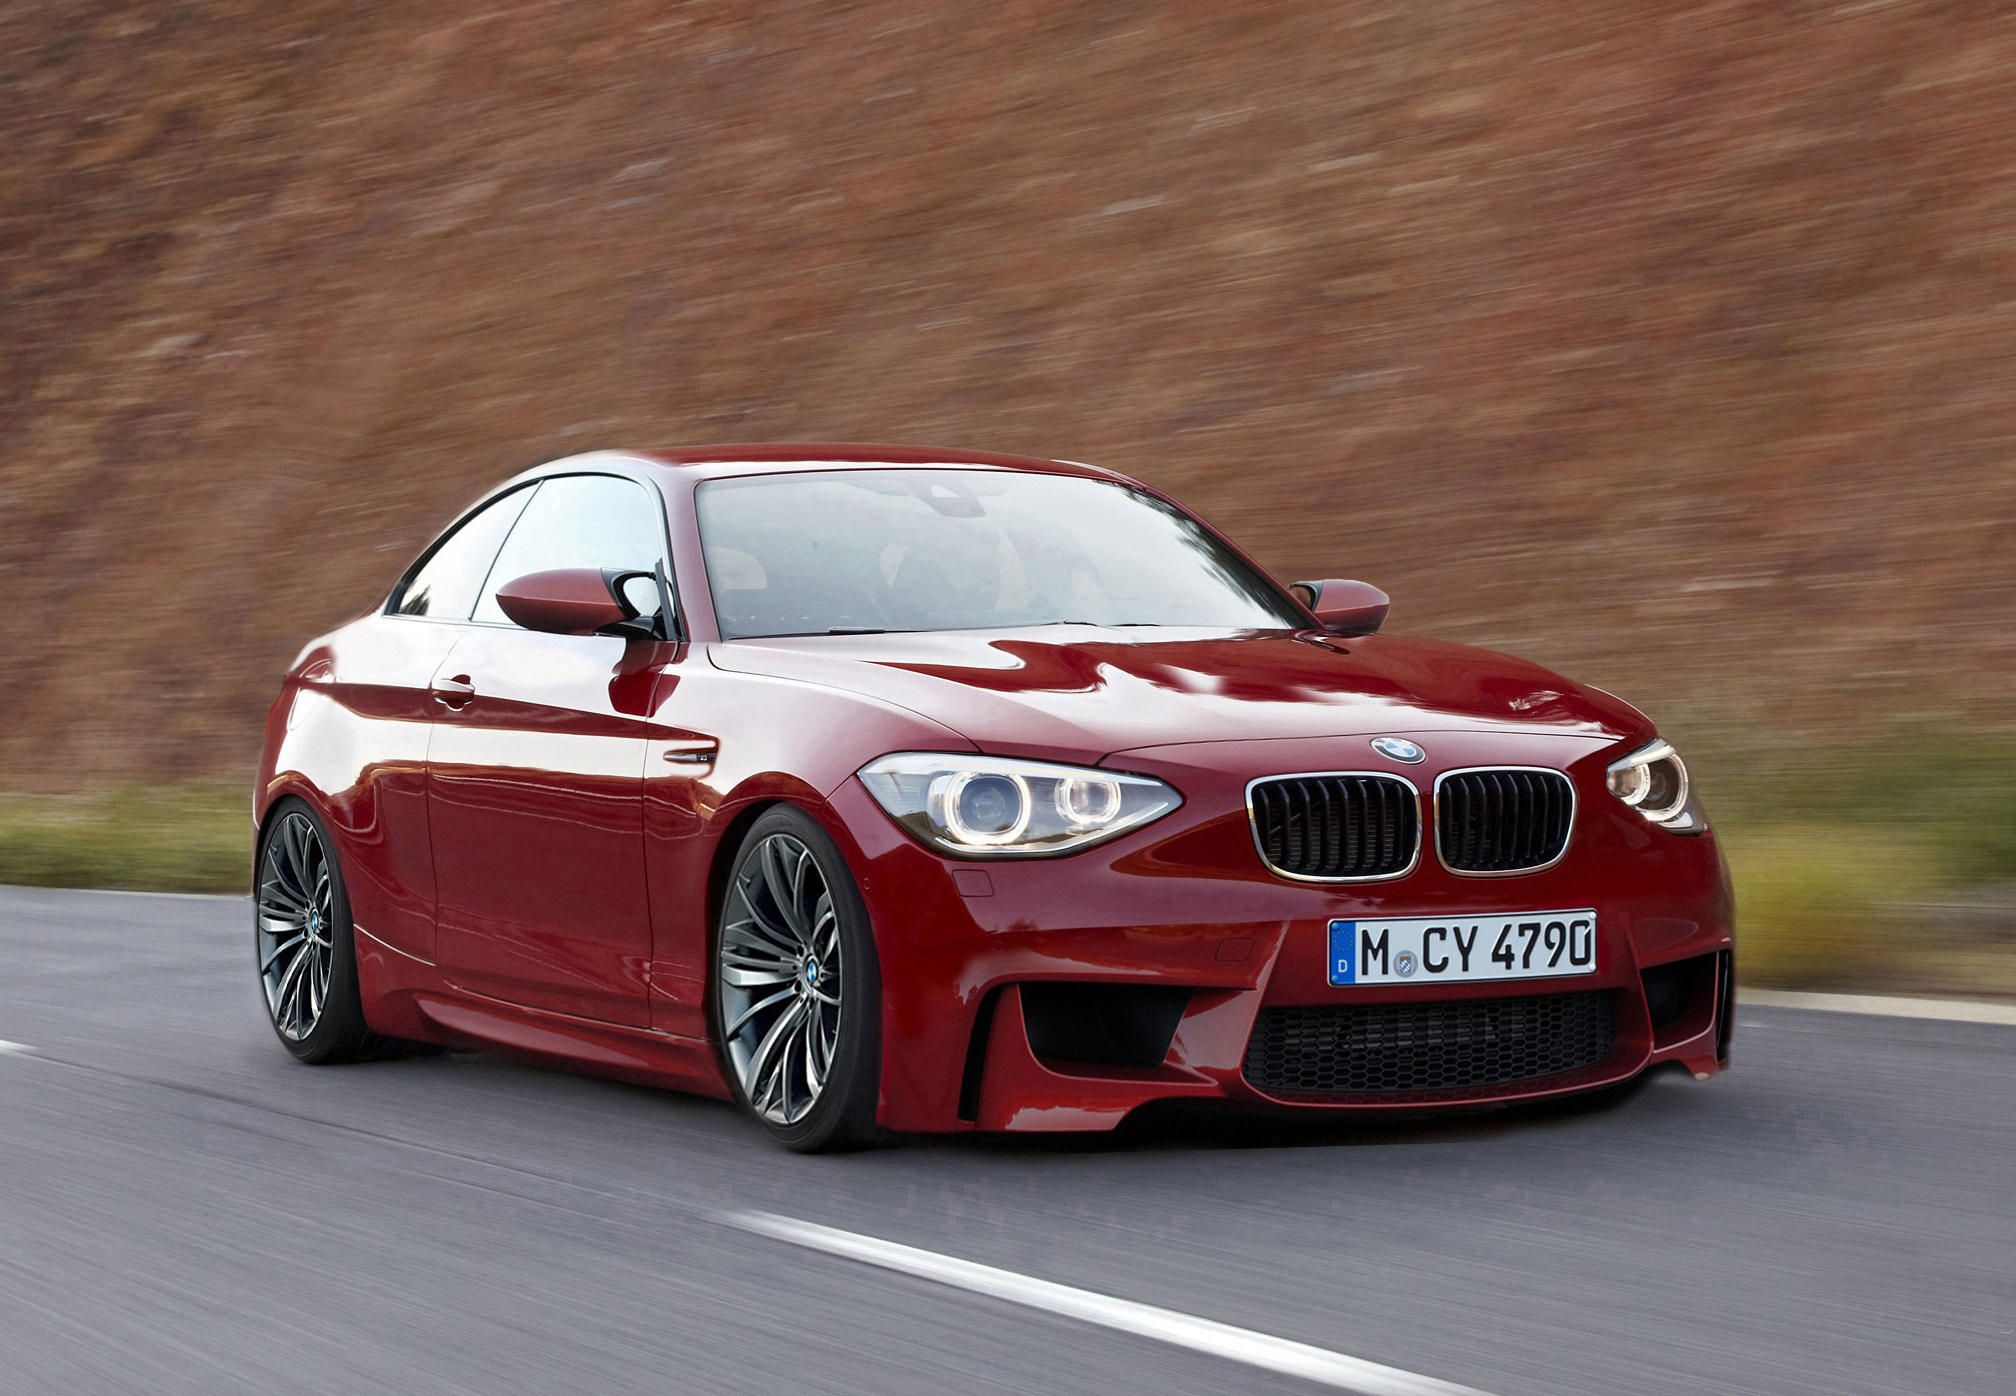 BMW 1M F20 CARS Pinterest